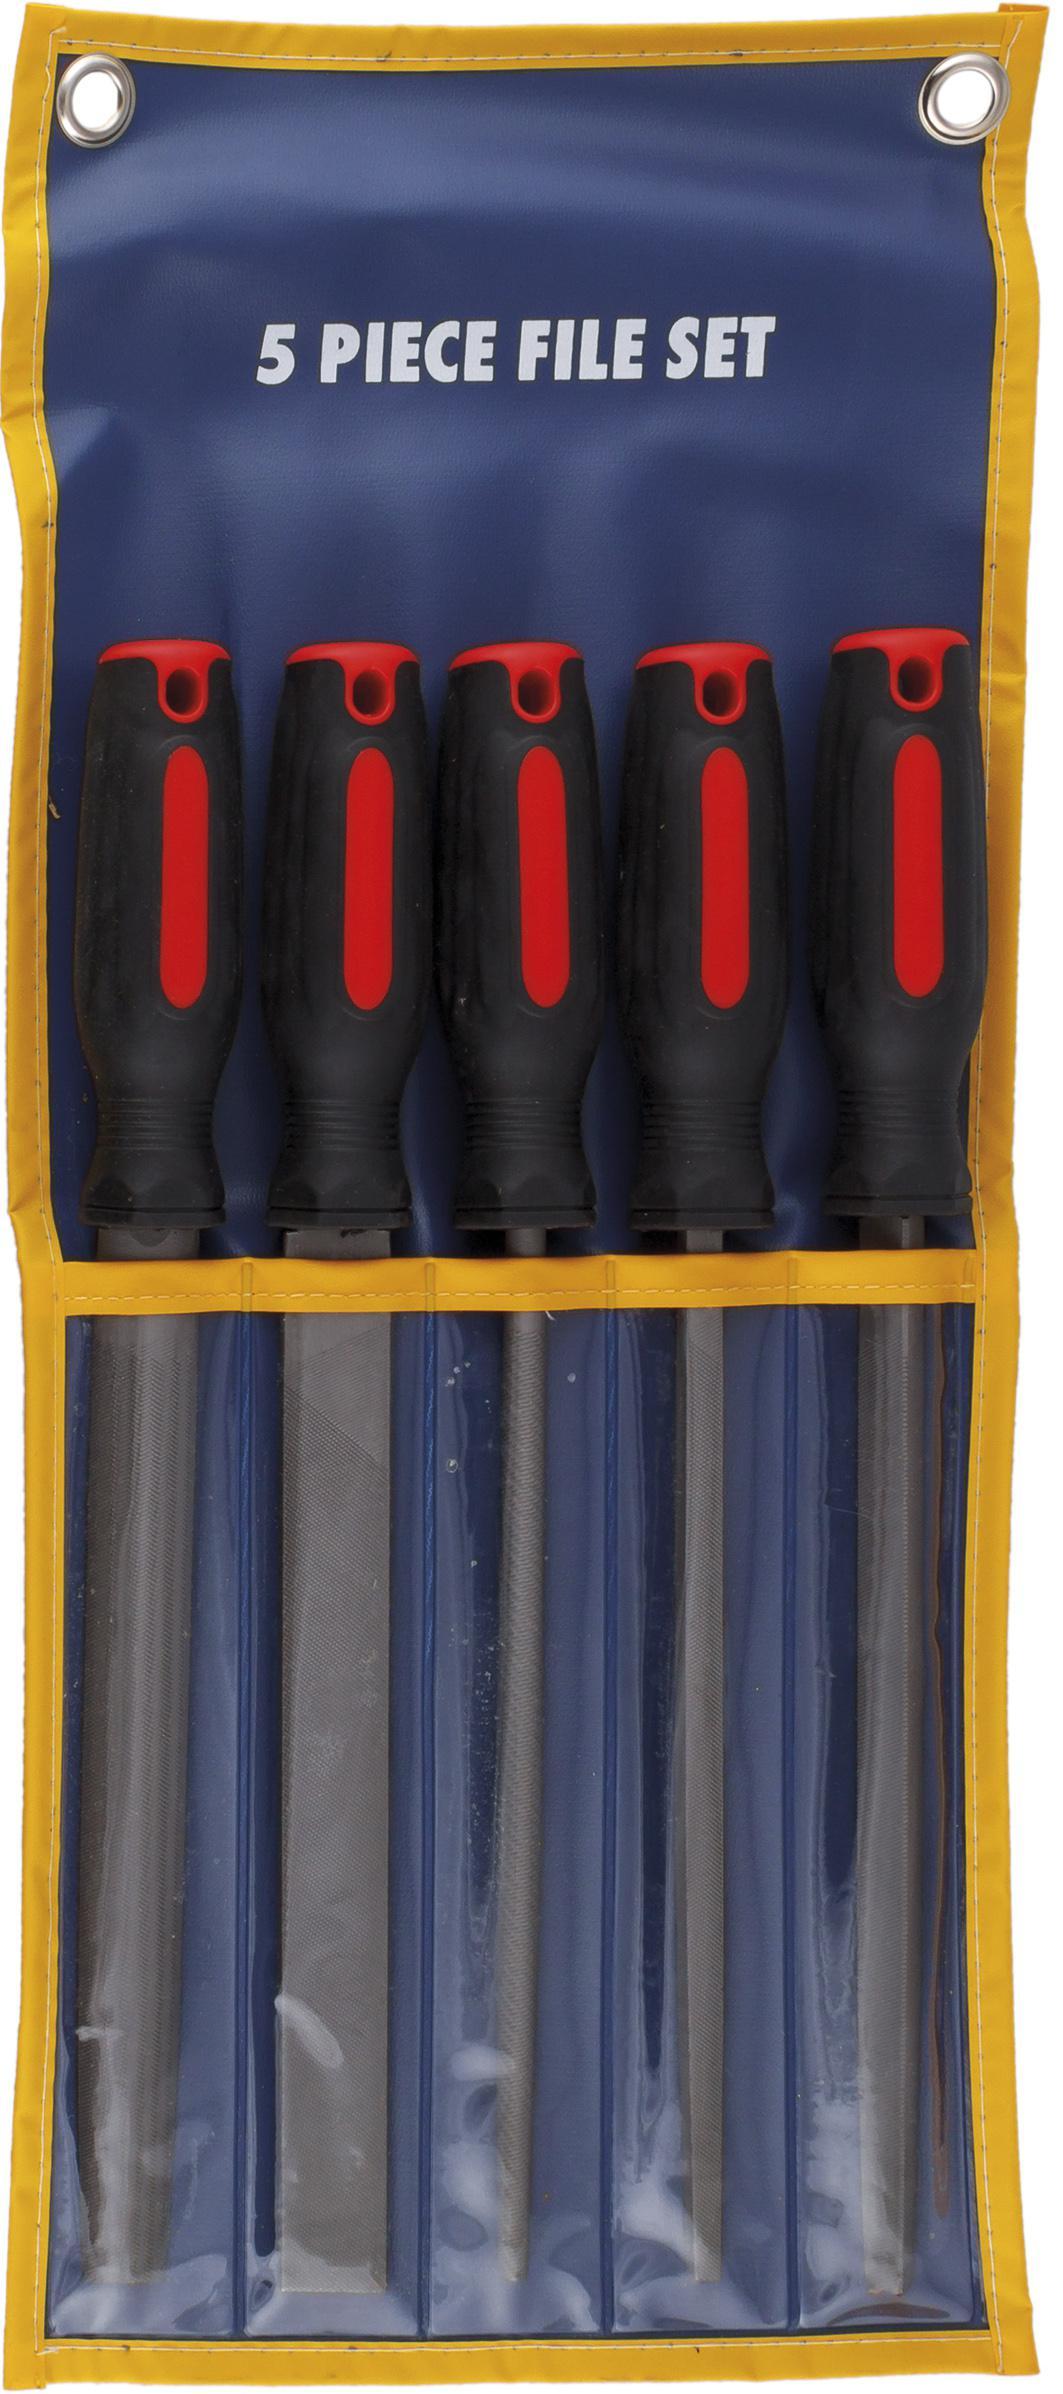 Набор напильников СТАНКОИМПОРТ Ka-f1012-8 набор для притирки клапанов станкоимпорт ka 7322k